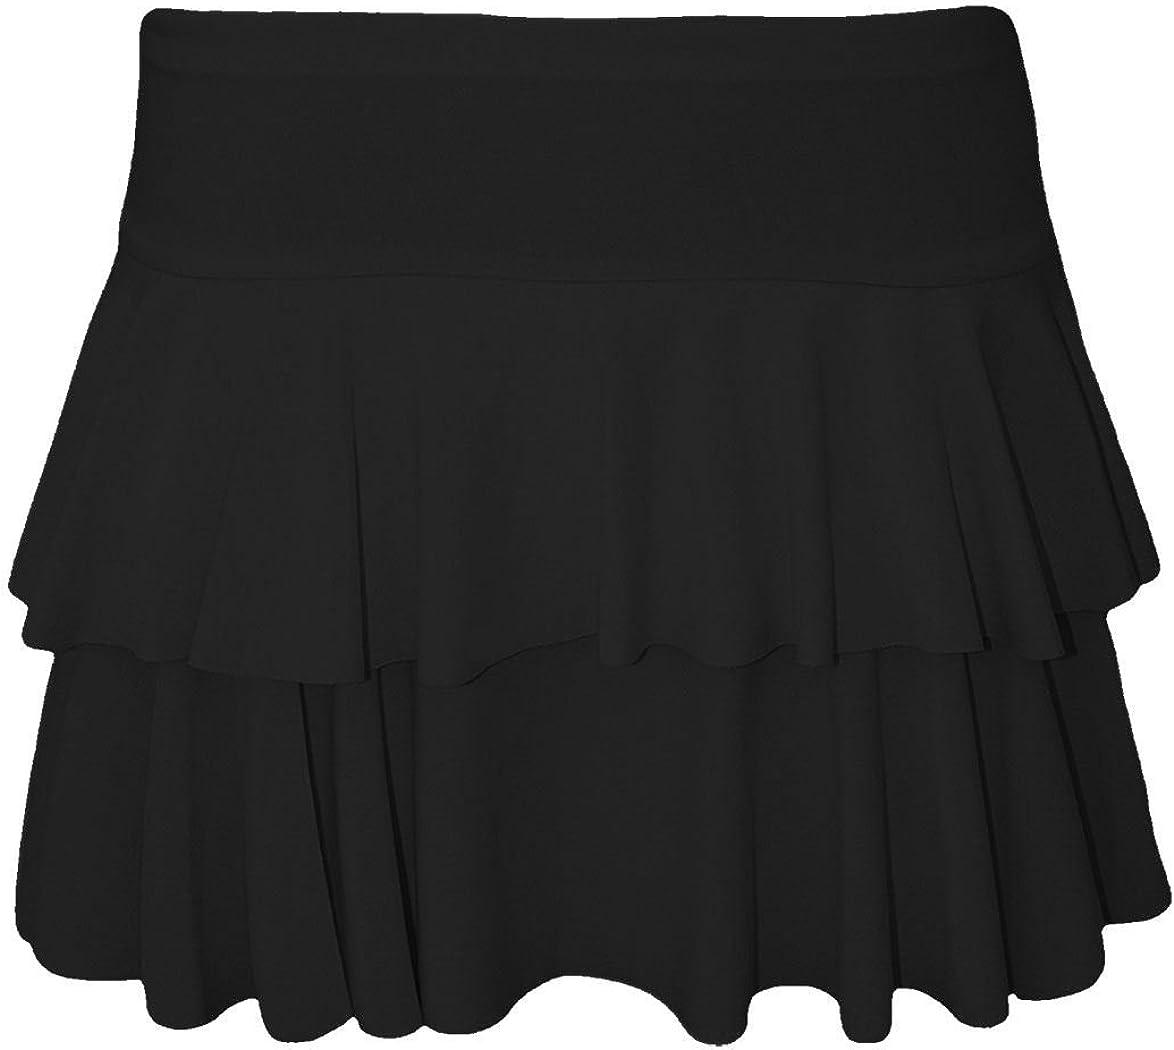 Ladies Womens Ruffle Frill Flared Mini Party Skirt Shorts High Waist UK 8-14